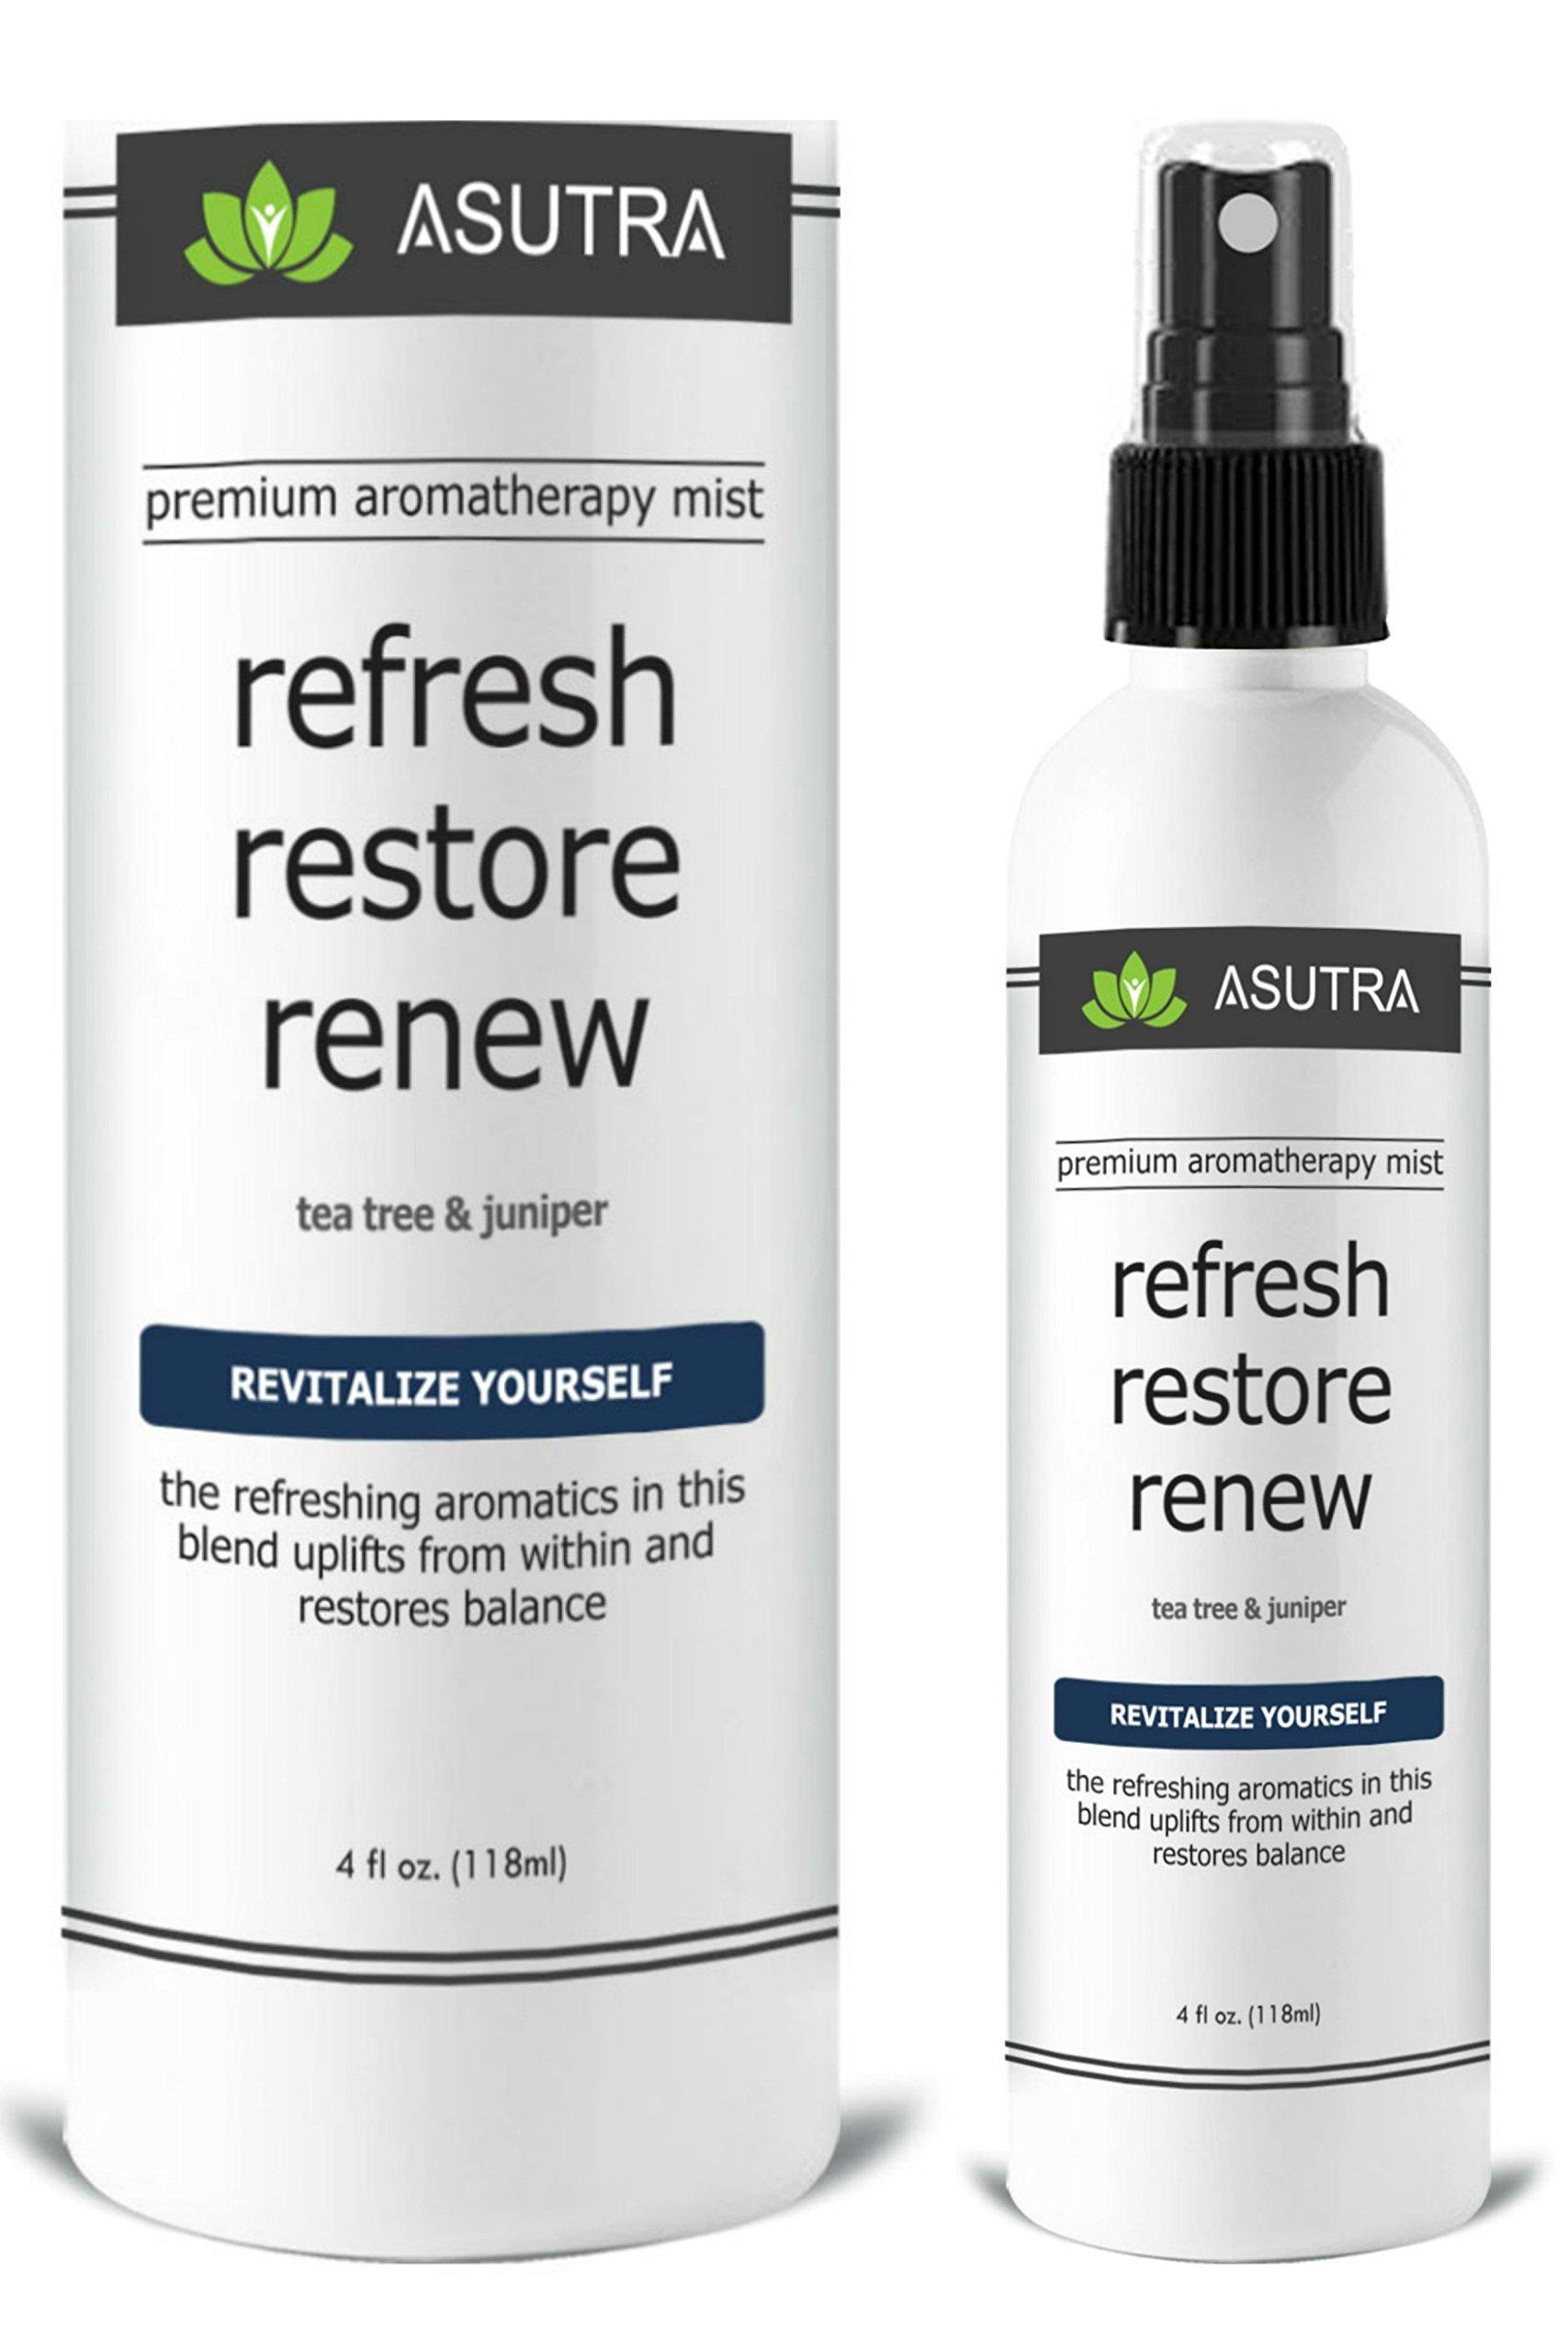 ASUTRA Premium Aromatherapy Mist -''REFRESH, RESTORE, RENEW'' - Revitalize Yourself - 100% ALL NATURAL & ORGANIC Room & Body Mist, Essential Oil Blend - Tea Tree & Juniper - 100% GUARANTEED